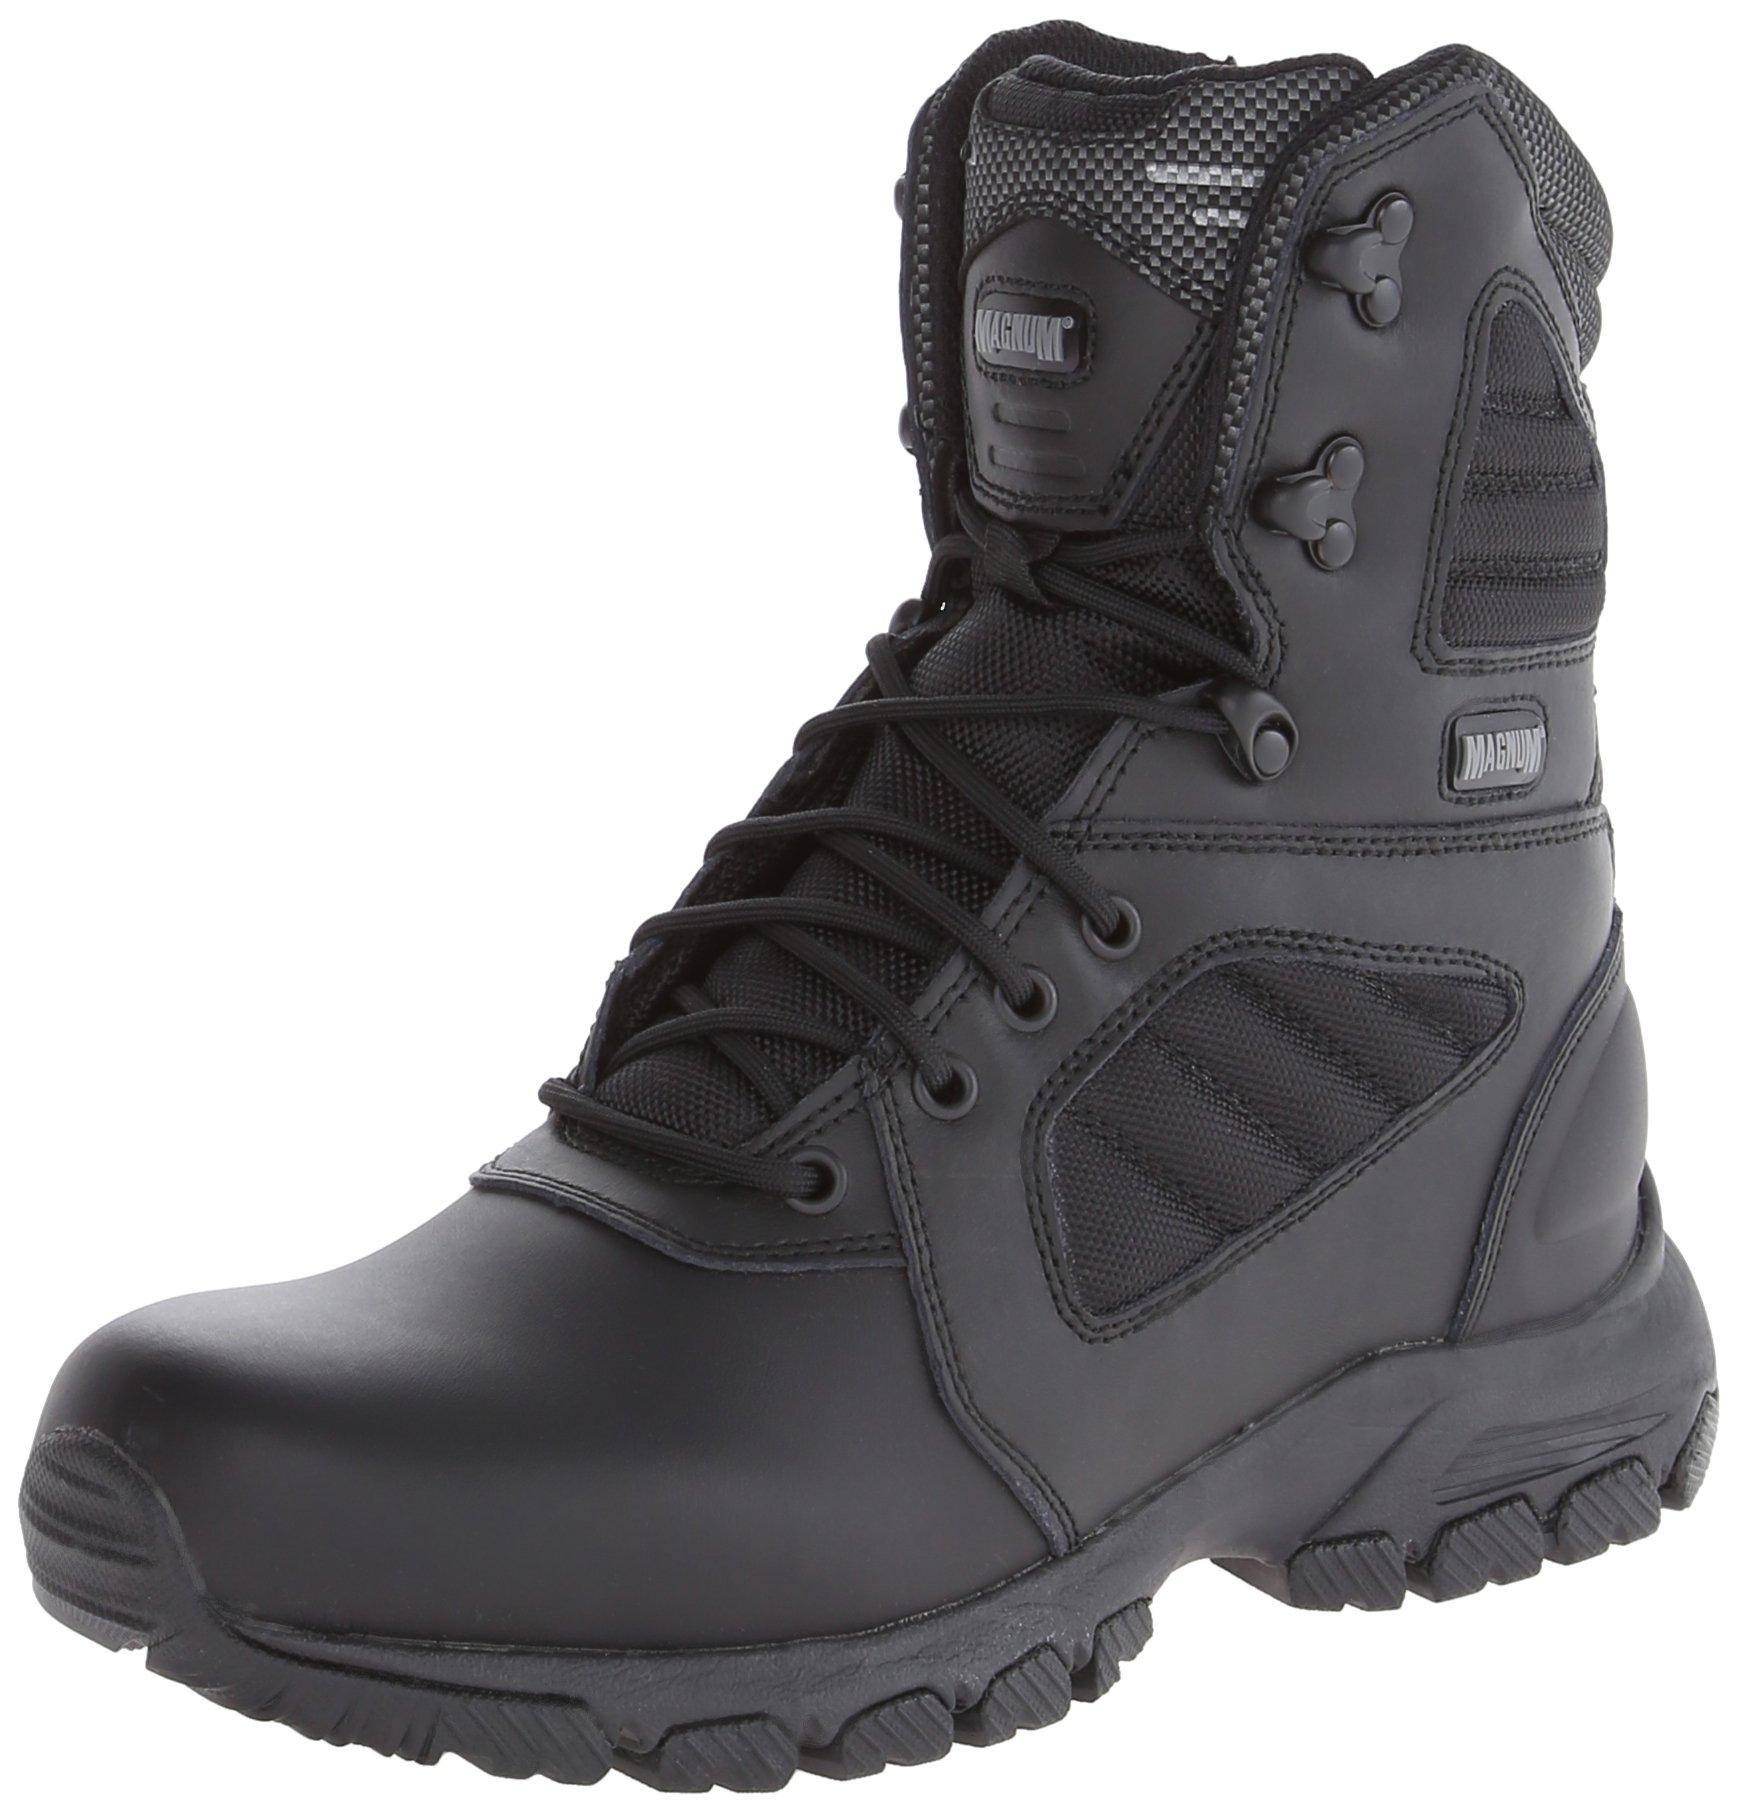 Magnum Men's Response III 8.0 Side-Zip Slip Resistant Work Boot,Black,7.5 M US